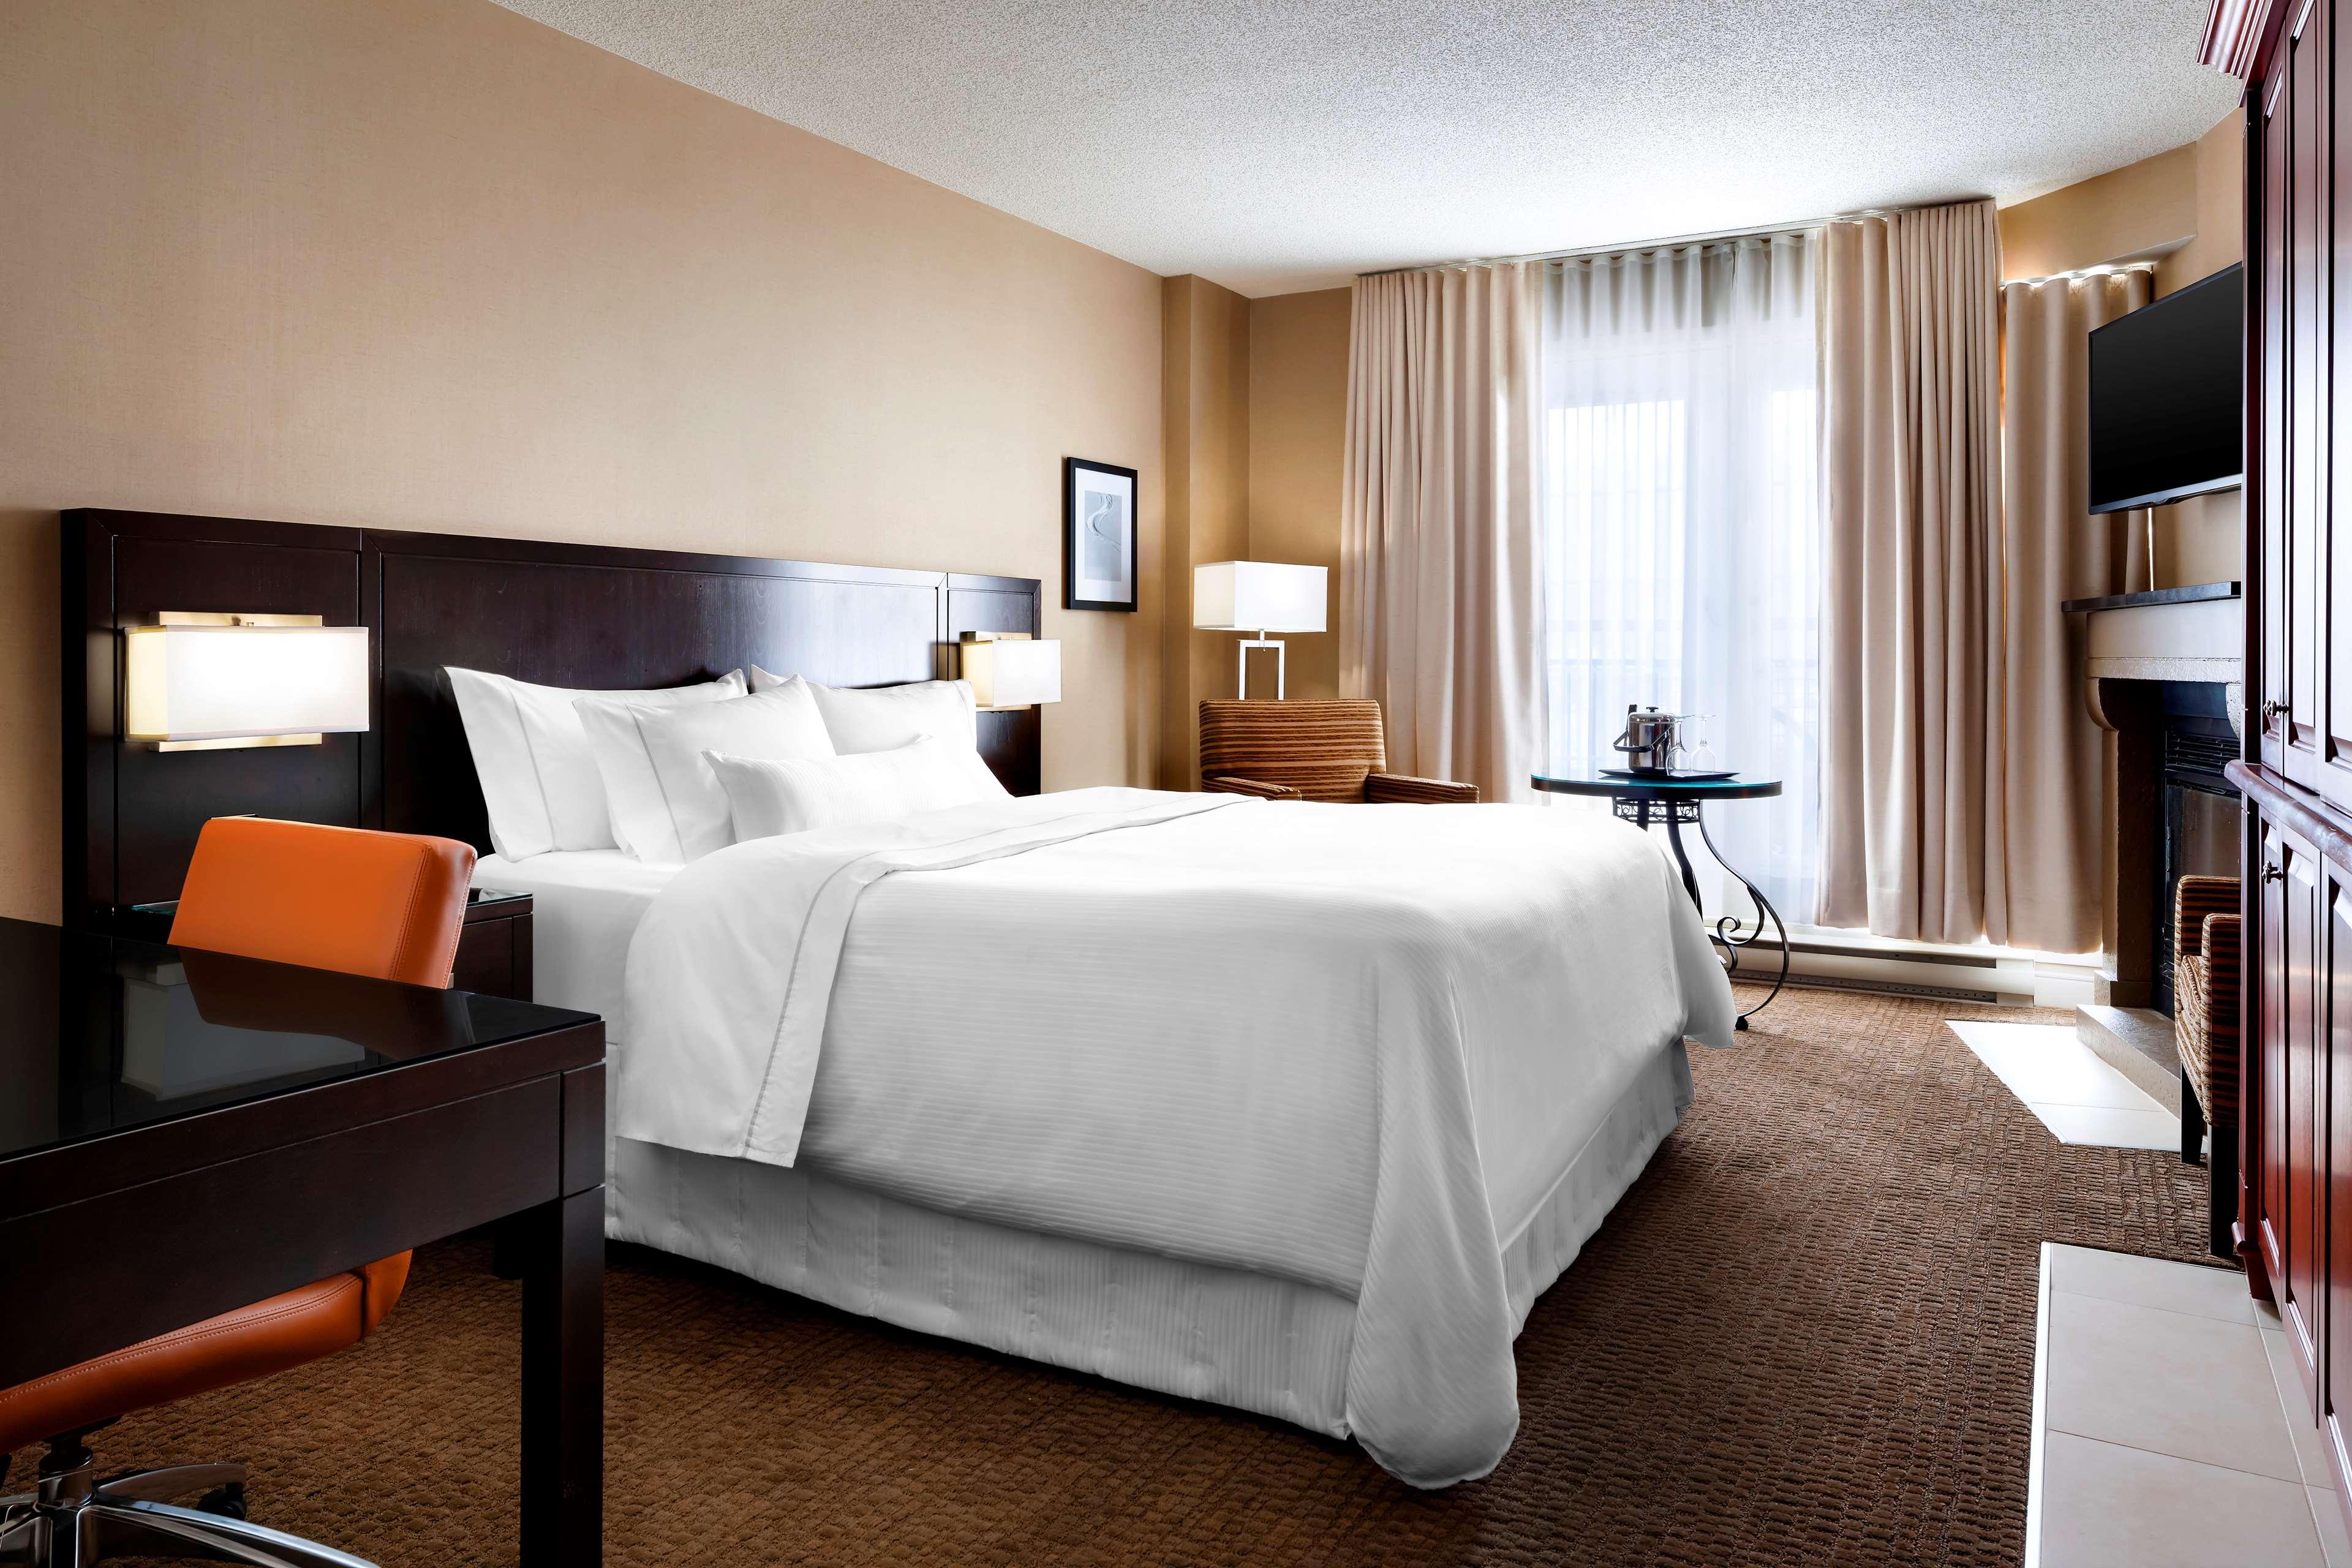 Le Westin Resort & Spa, Tremblant, Quebec à Mont Tremblant: Traditional Hotel Room